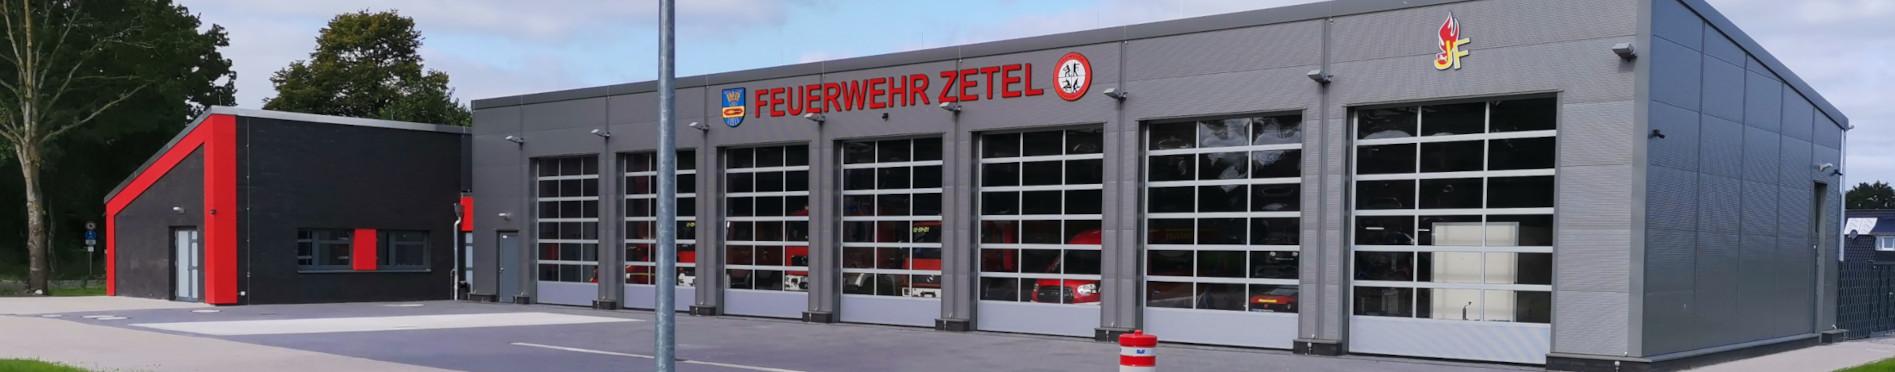 Hintergrundbild, Feuerwehrfahrzeuge